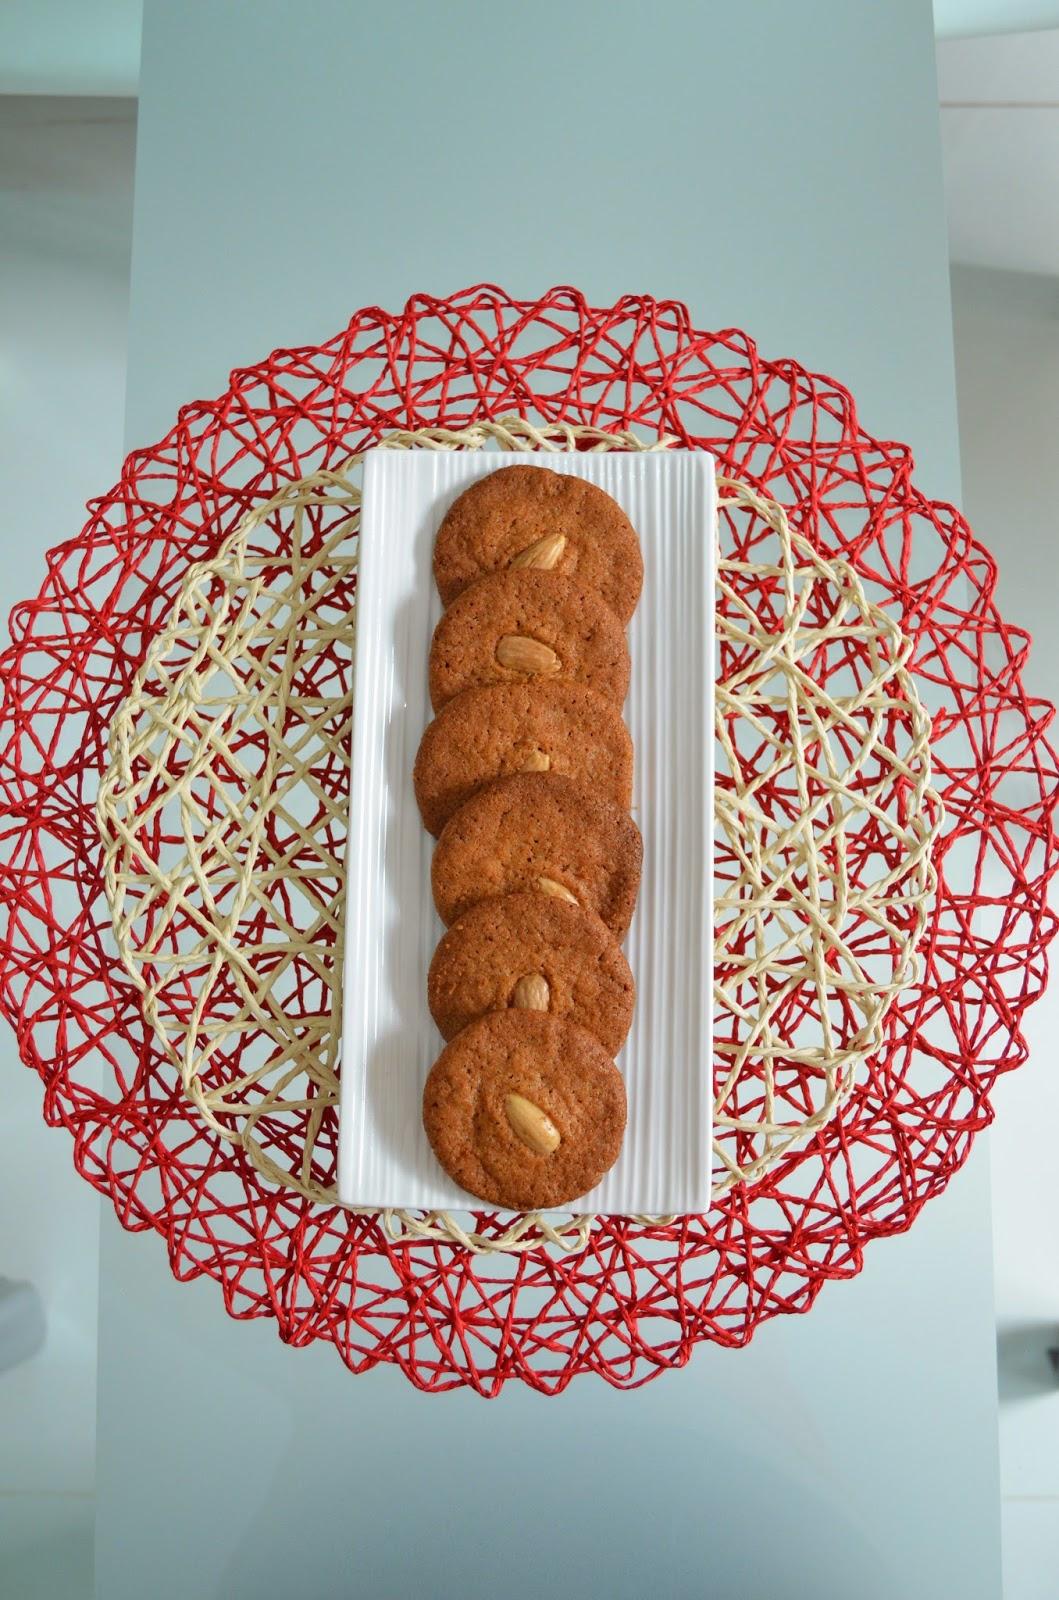 Mi ruta gastronómica por Madeira: galletas de miel o broas de miel